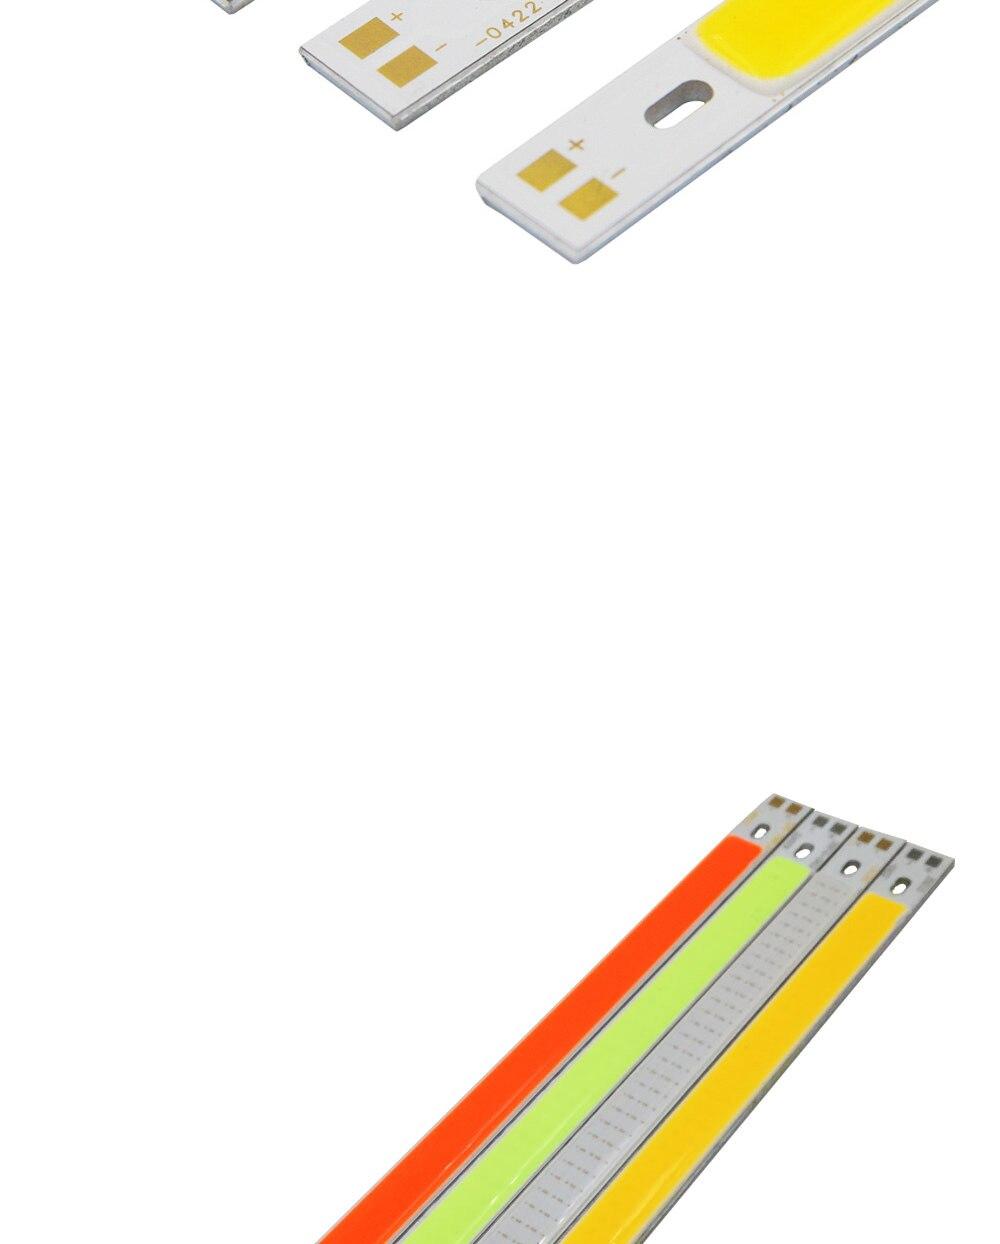 cob led light strip lamp bulb car auto lighting 10w 12V (7)